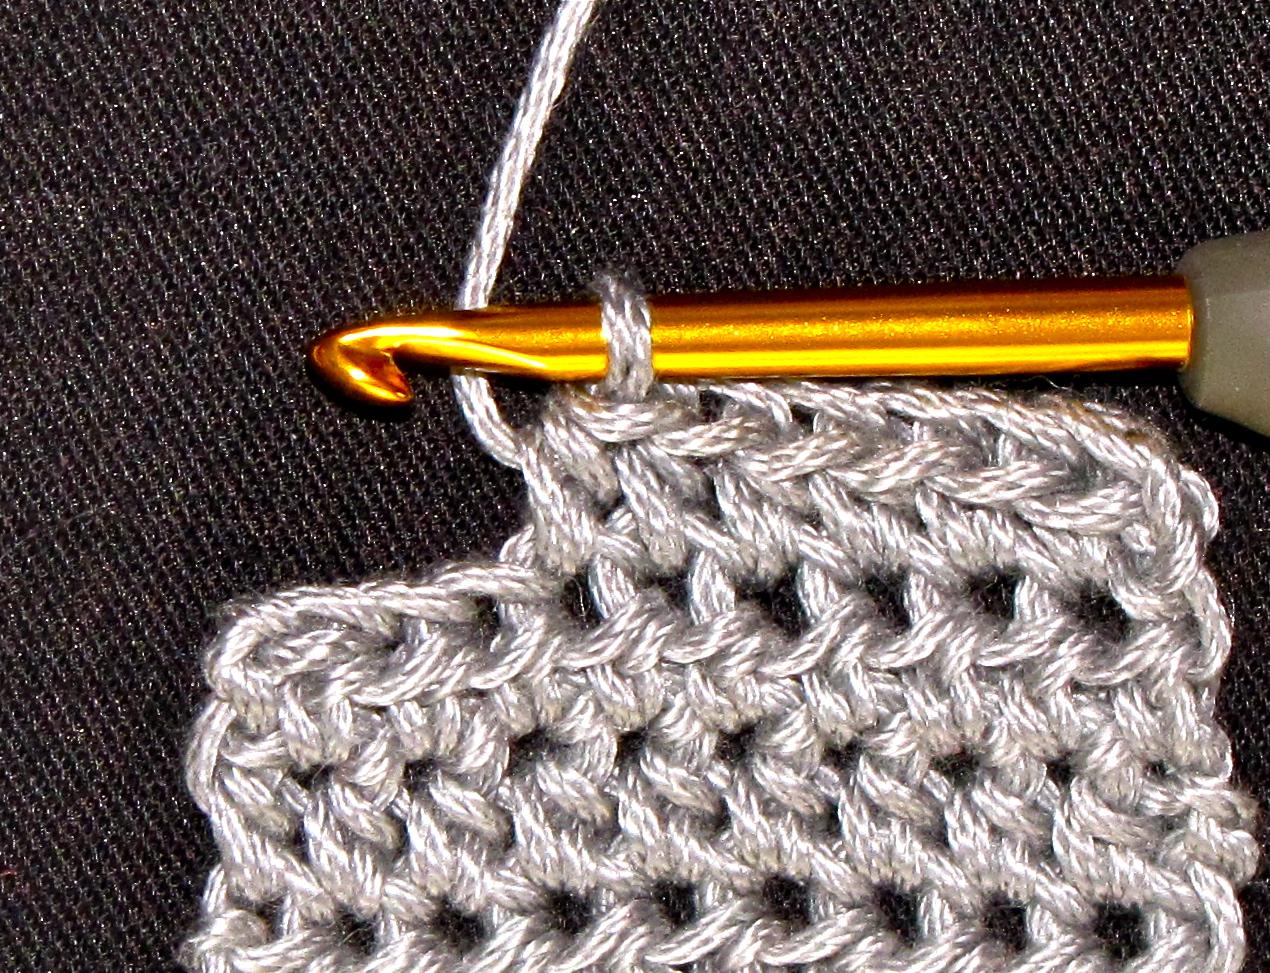 ... Crochet Pattern Companion: That Tricky Half Double Crochet Stitch (hdc